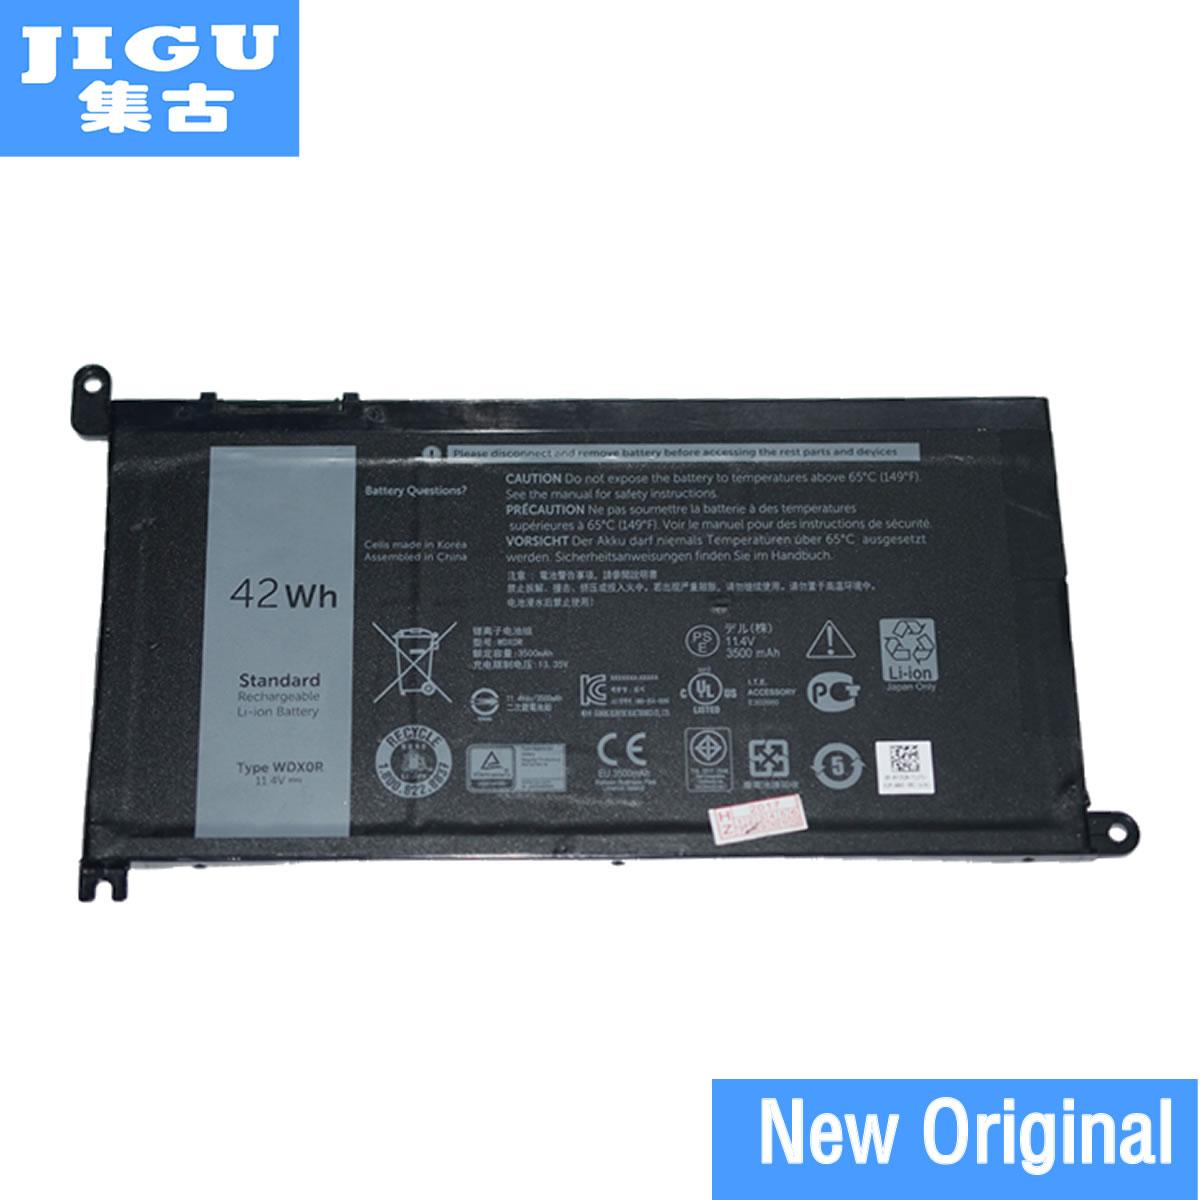 JIGU Bateria Do Laptop Original 3CRH3 WDX0R T2JX4 13 15MF PRO-1508T WDXOR Para DELL Para Inspiron 5000 5368 5378